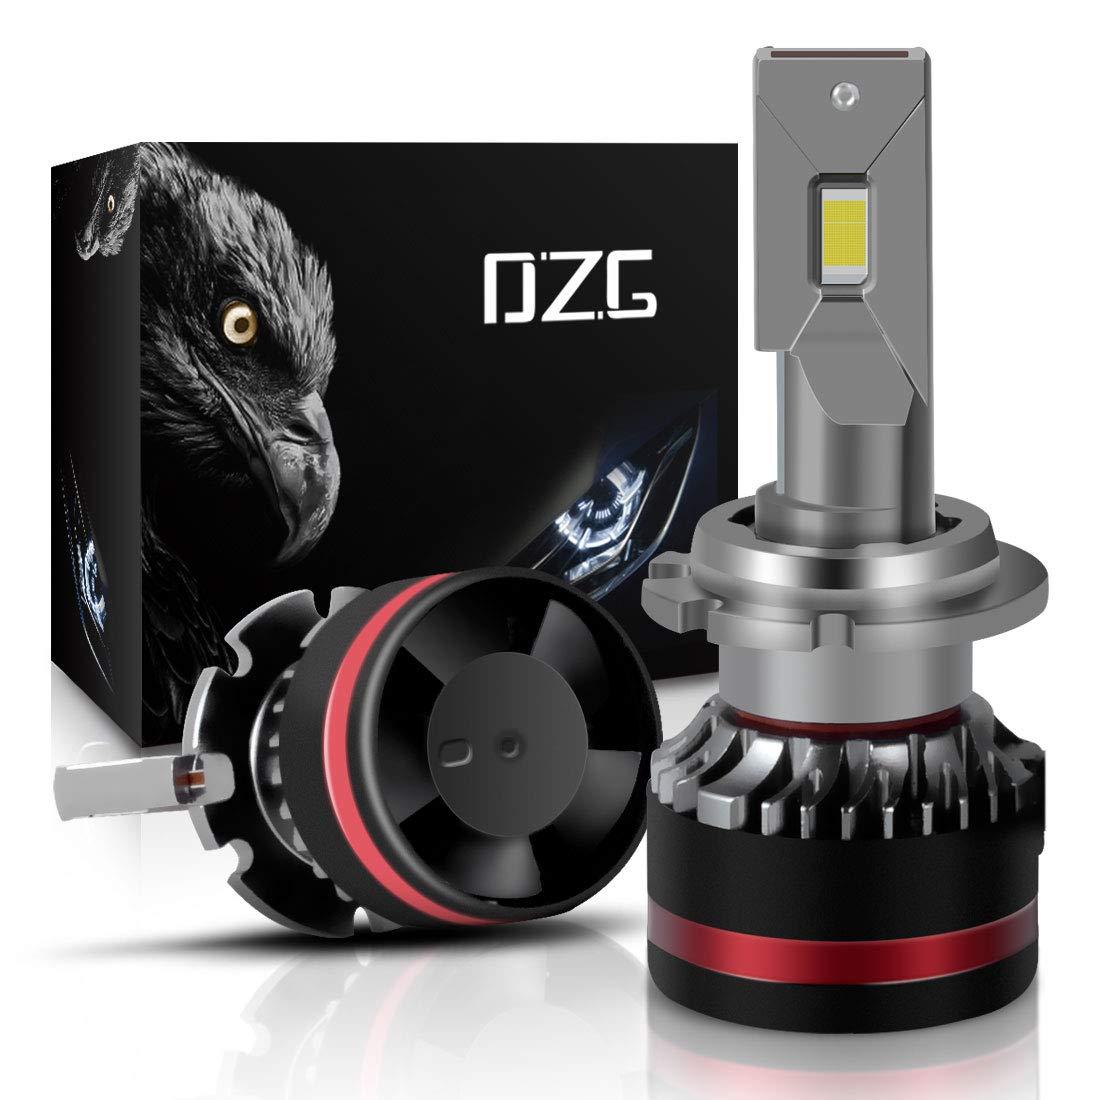 DZG D2S//D2R//D4S//D4R LED Headlight Bulbs 6000K Bright White 2 Yr Warranty-2 Pack